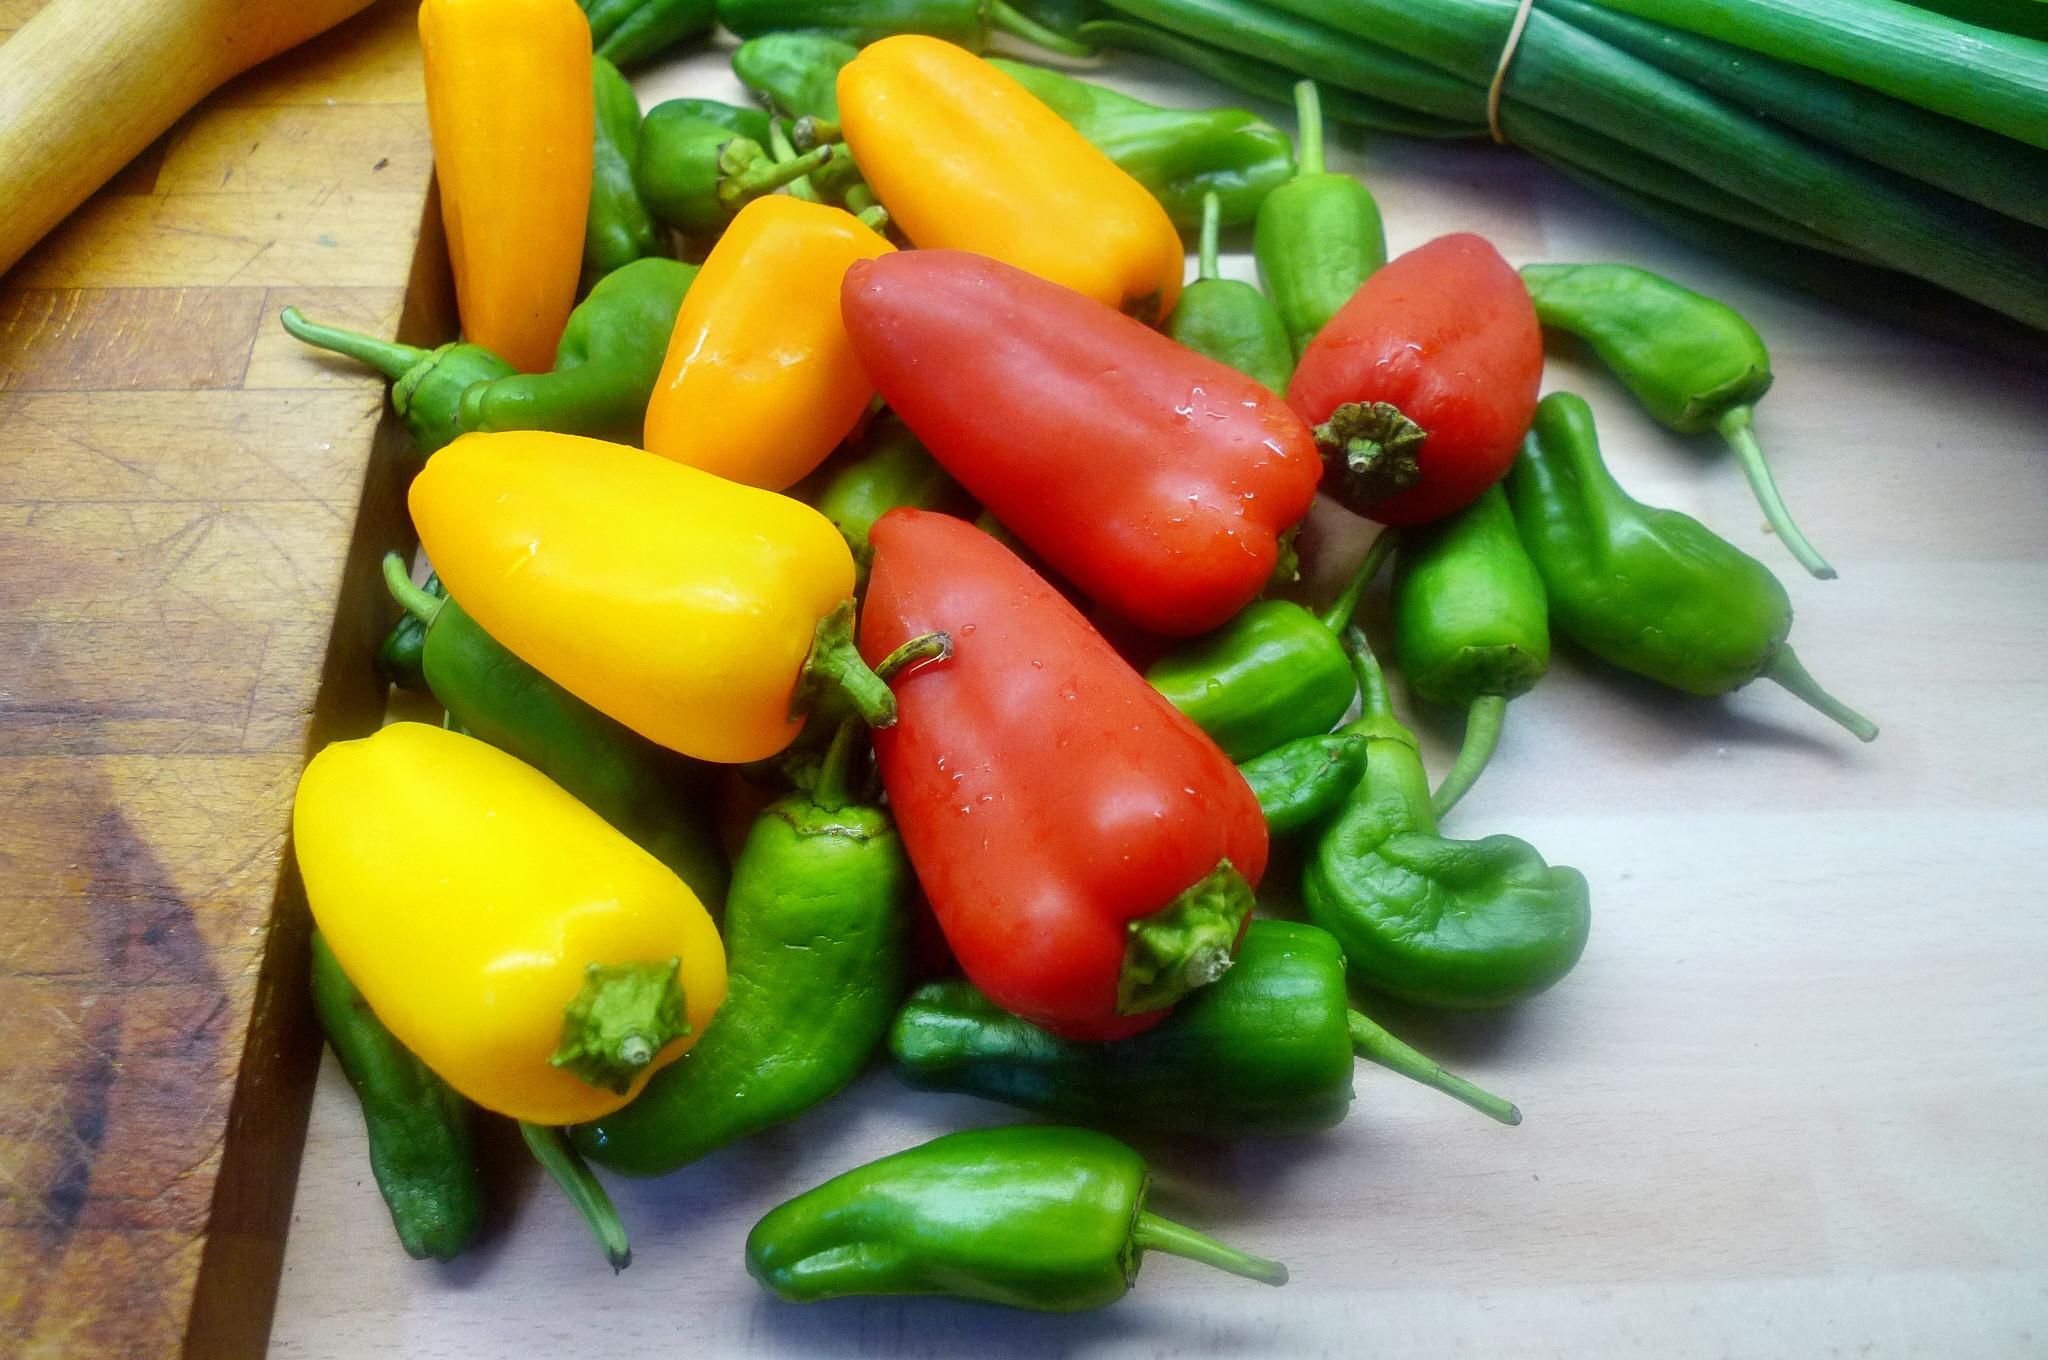 Pimentos-Paprika-Kartoffel-Salat-Buttermilch- 28.9.14   (2)